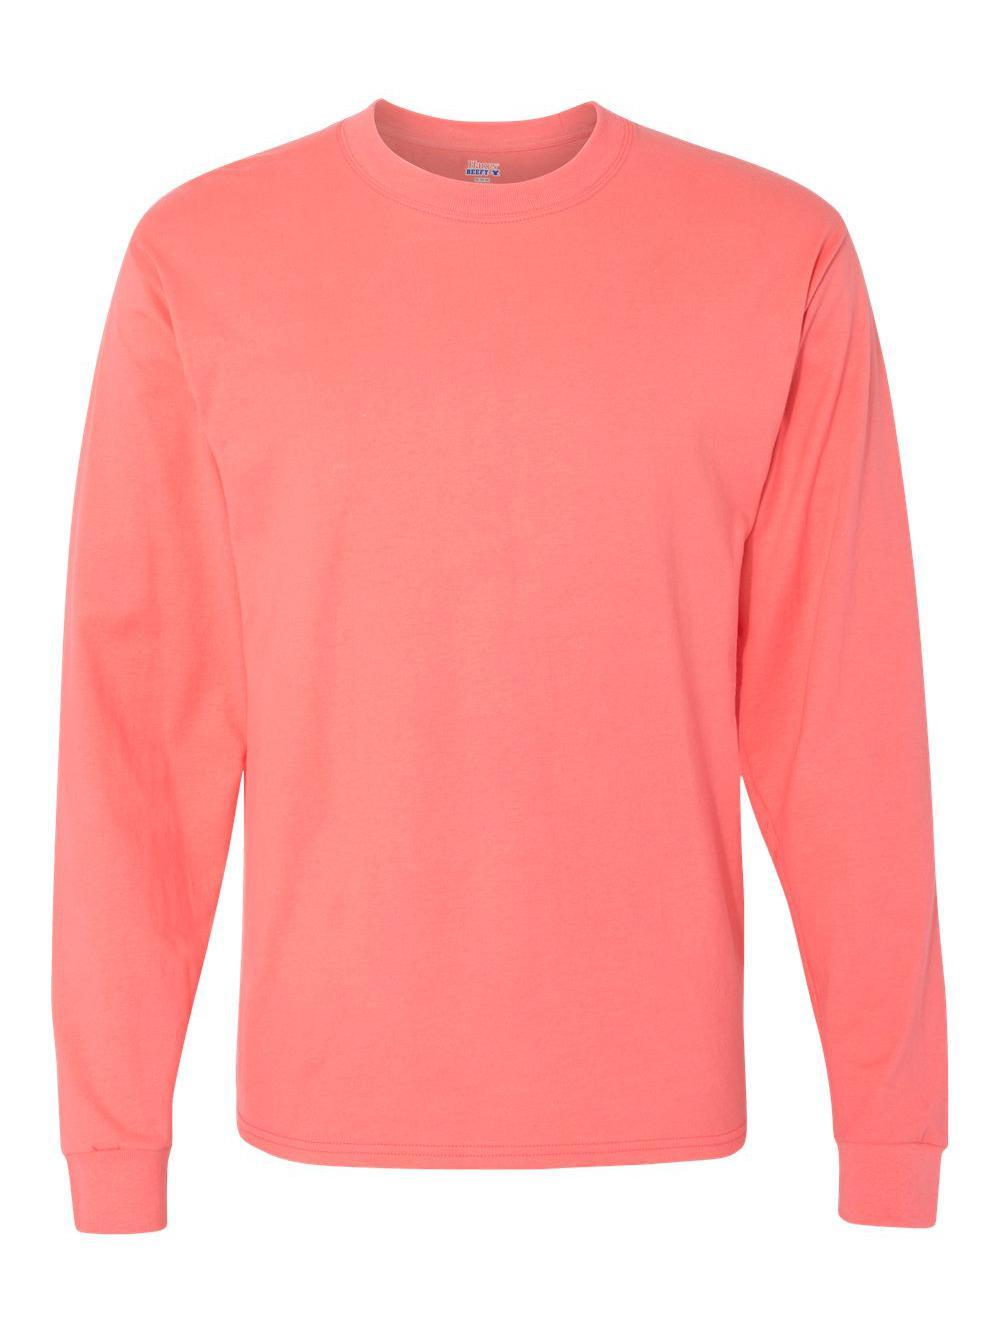 Hanes-Beefy-T-Long-Sleeve-T-Shirt-5186 thumbnail 18